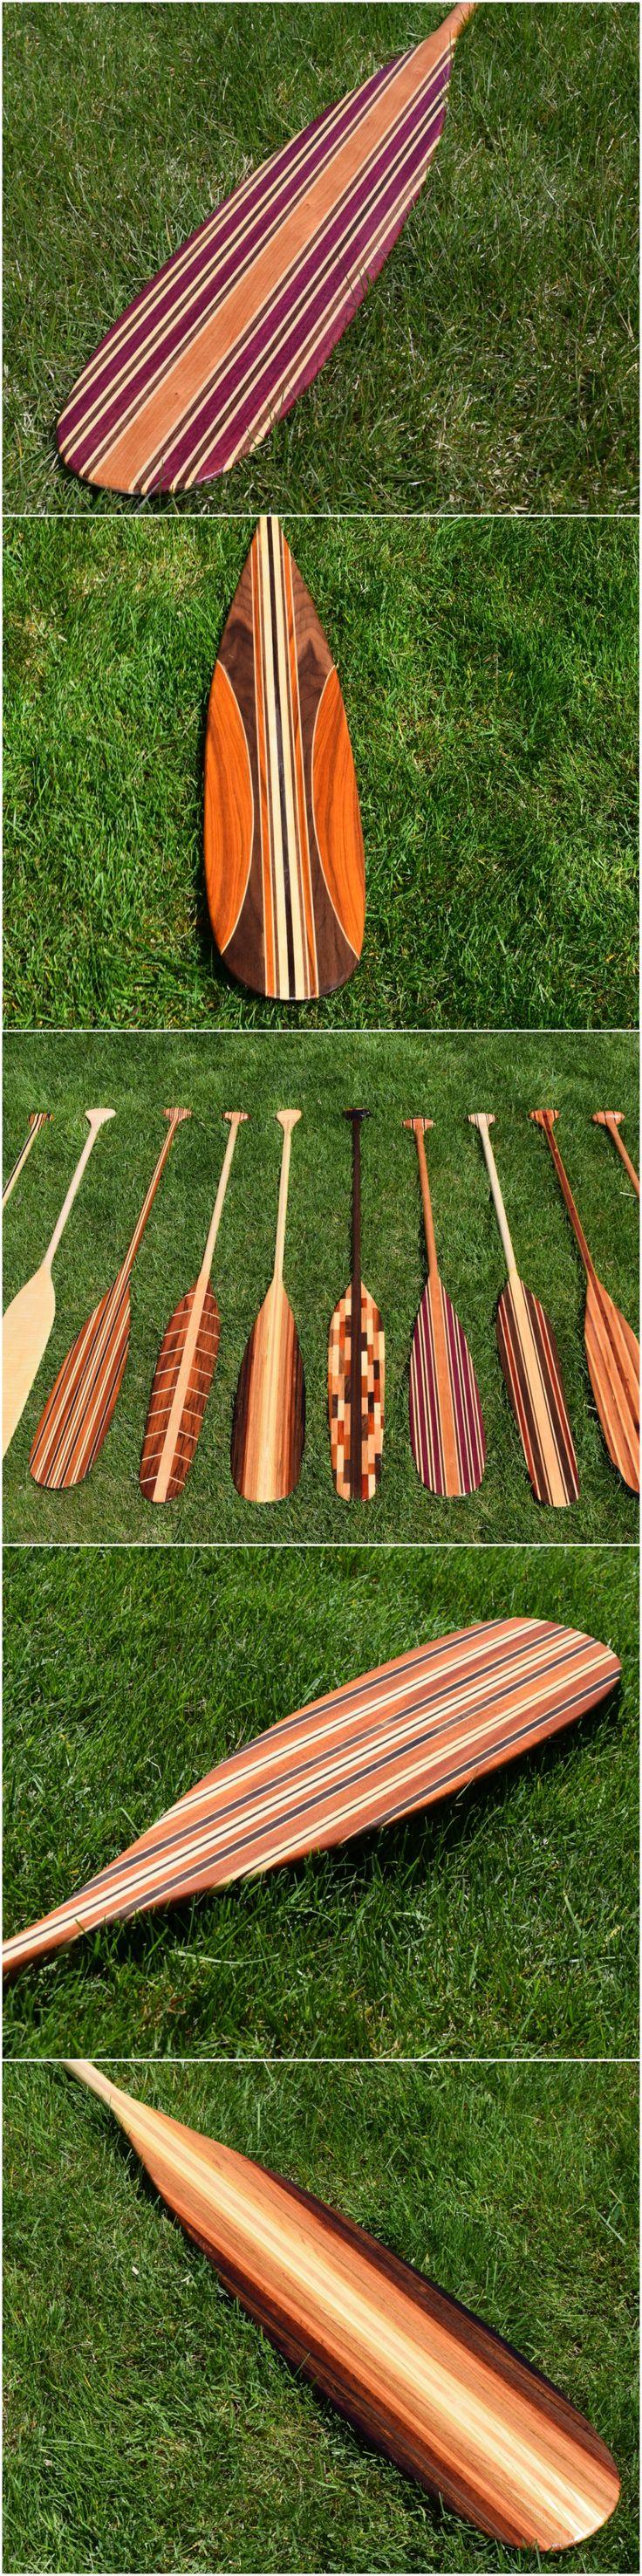 Custom Canoe Paddles by Winnebago Paddles! #WinnebagoPaddles